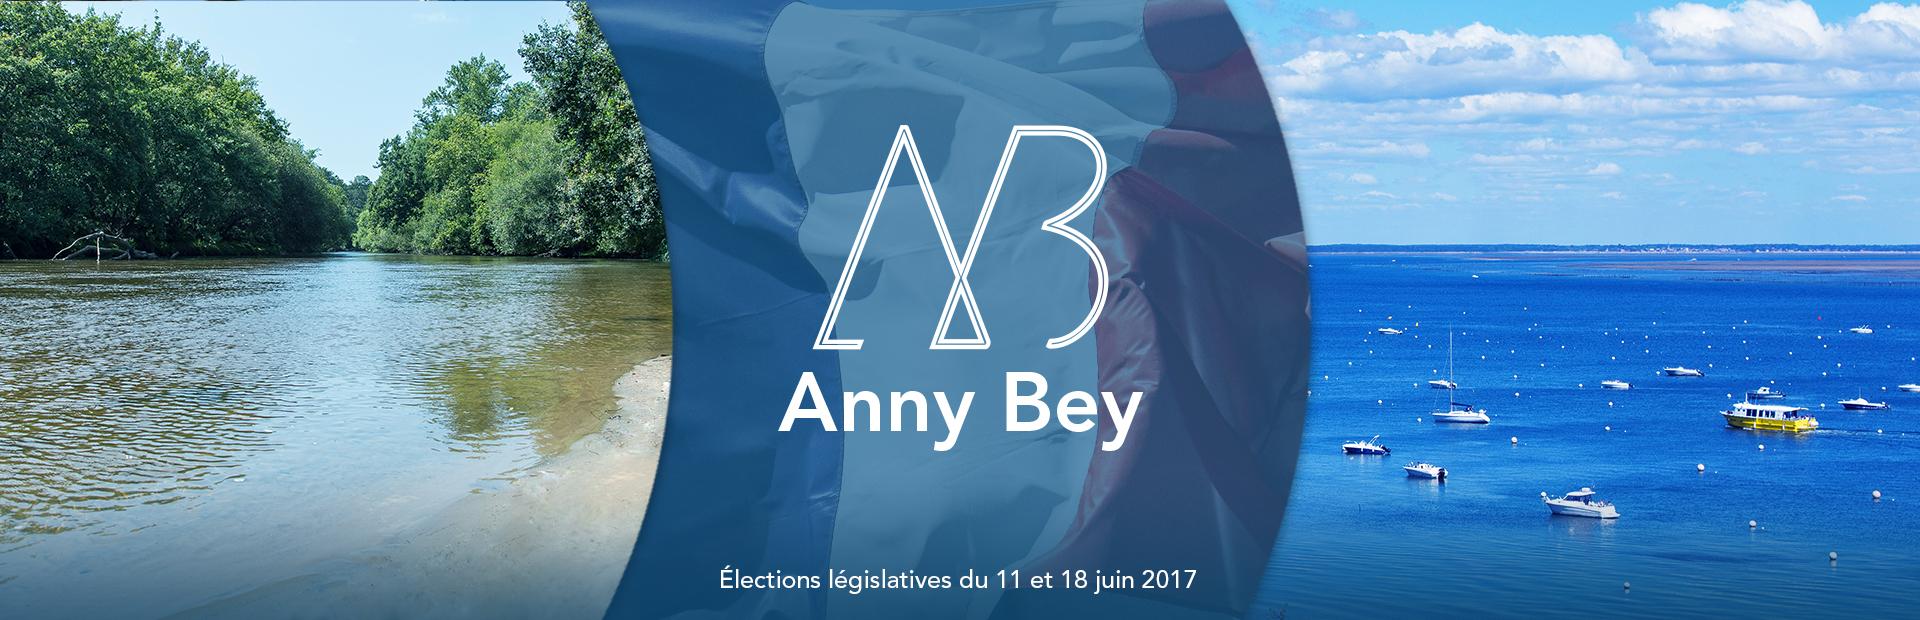 bandeau Anny Bey 2017